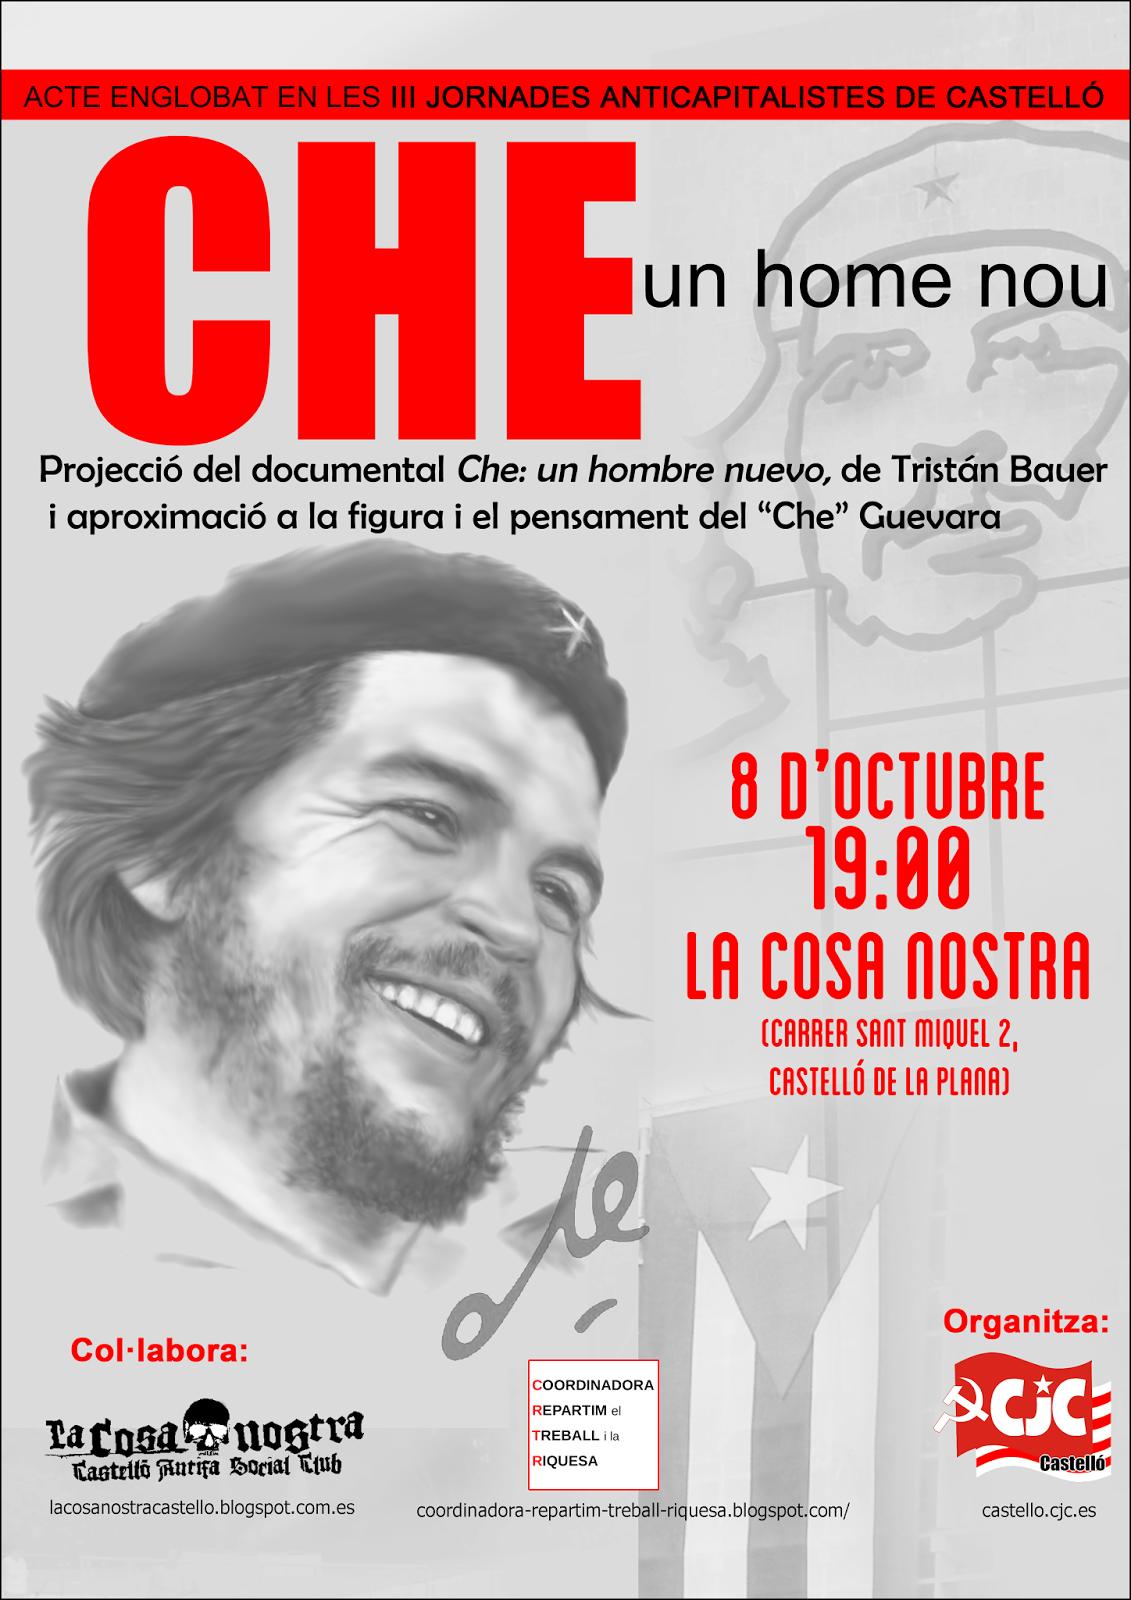 [CJC  Castelló] Homenatge al Che Guevara, l'home nou  Cartell+che